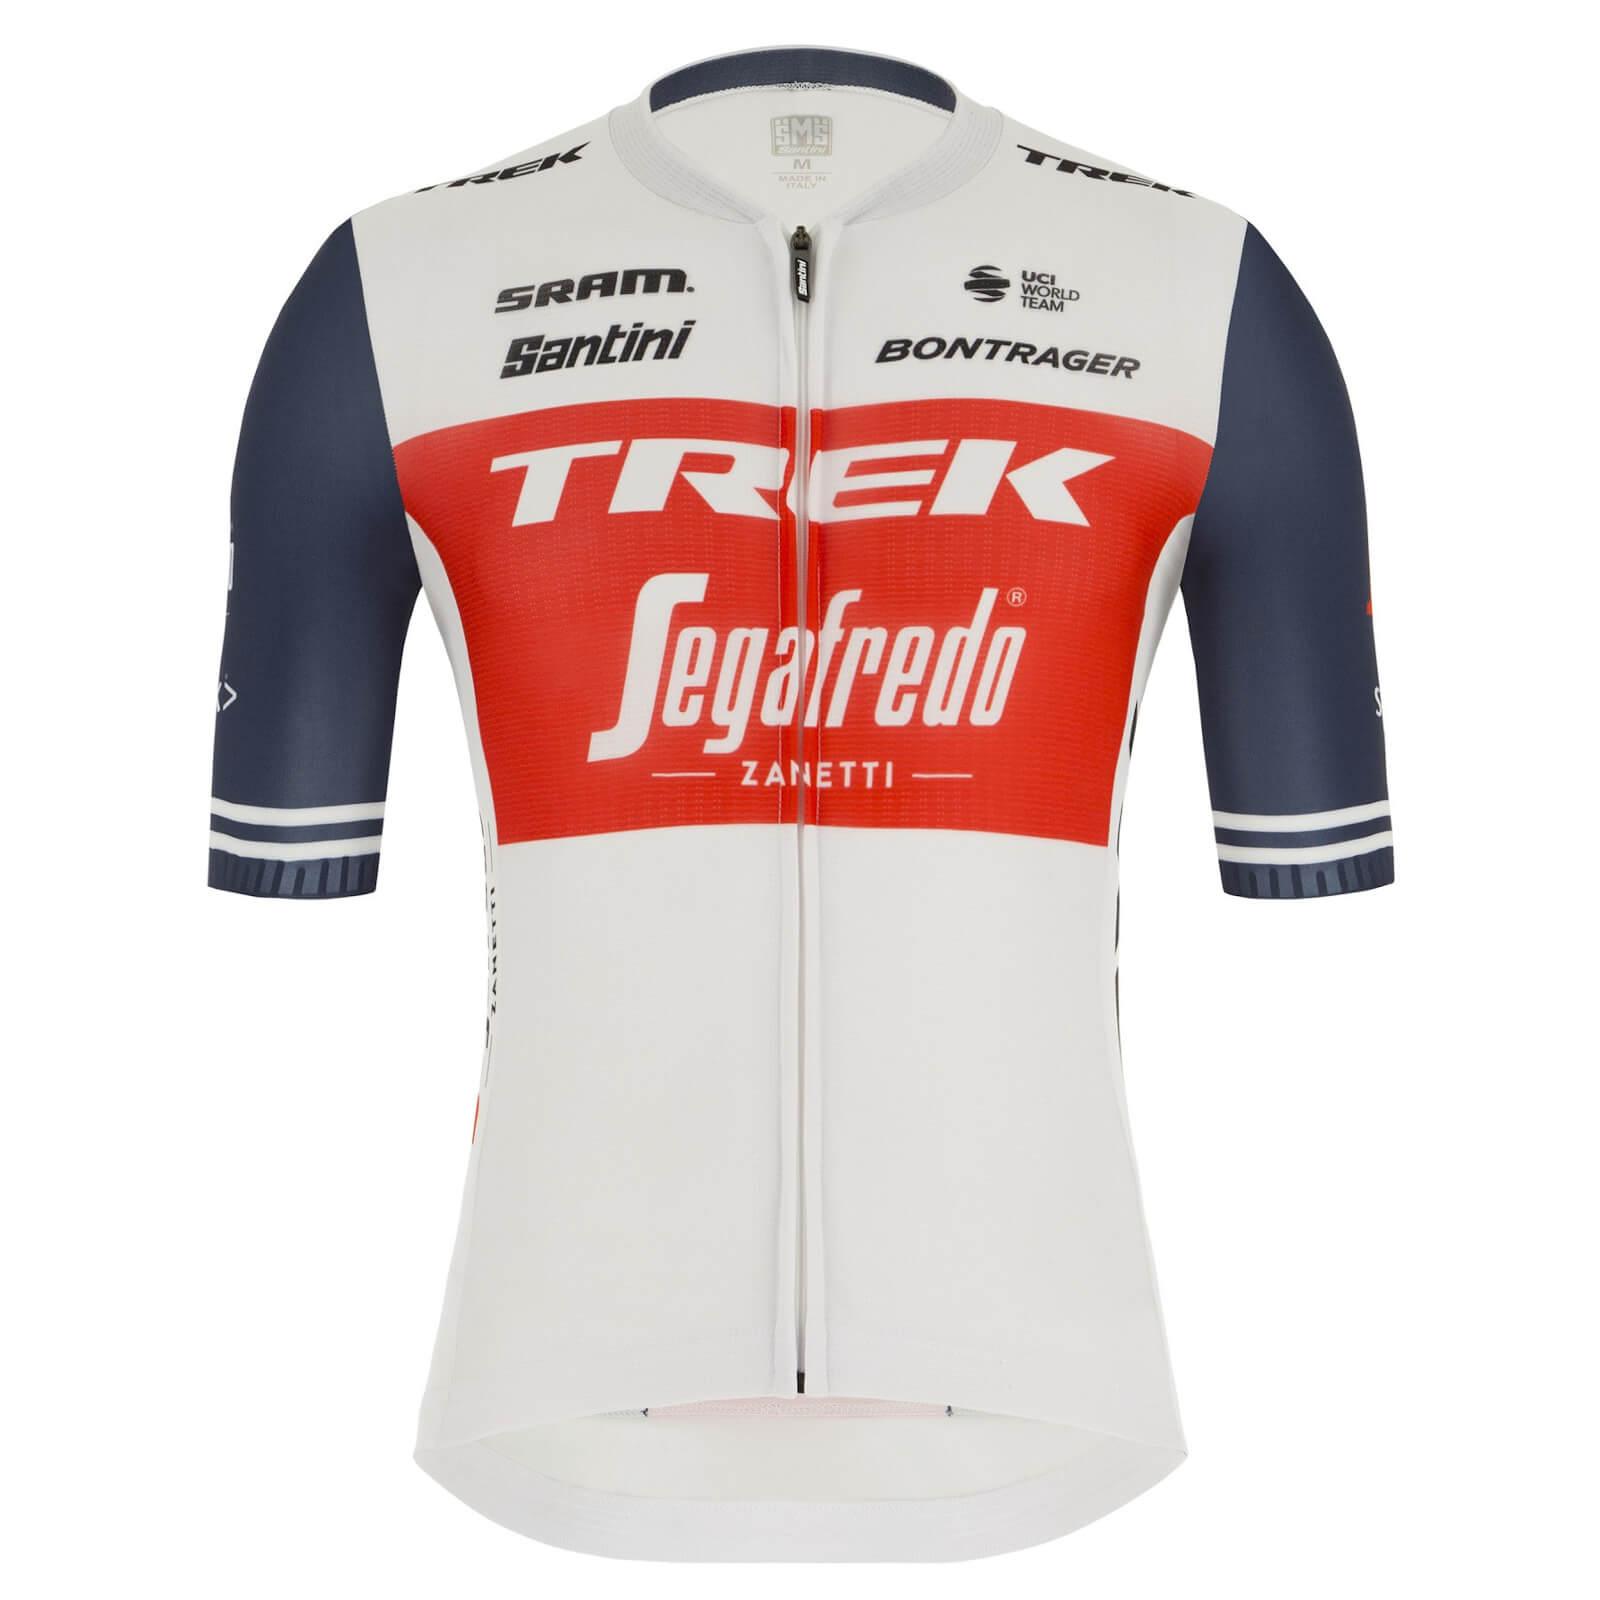 Santini Trek-Segafredo Pro Team Eco Sleek Race Jersey - XS